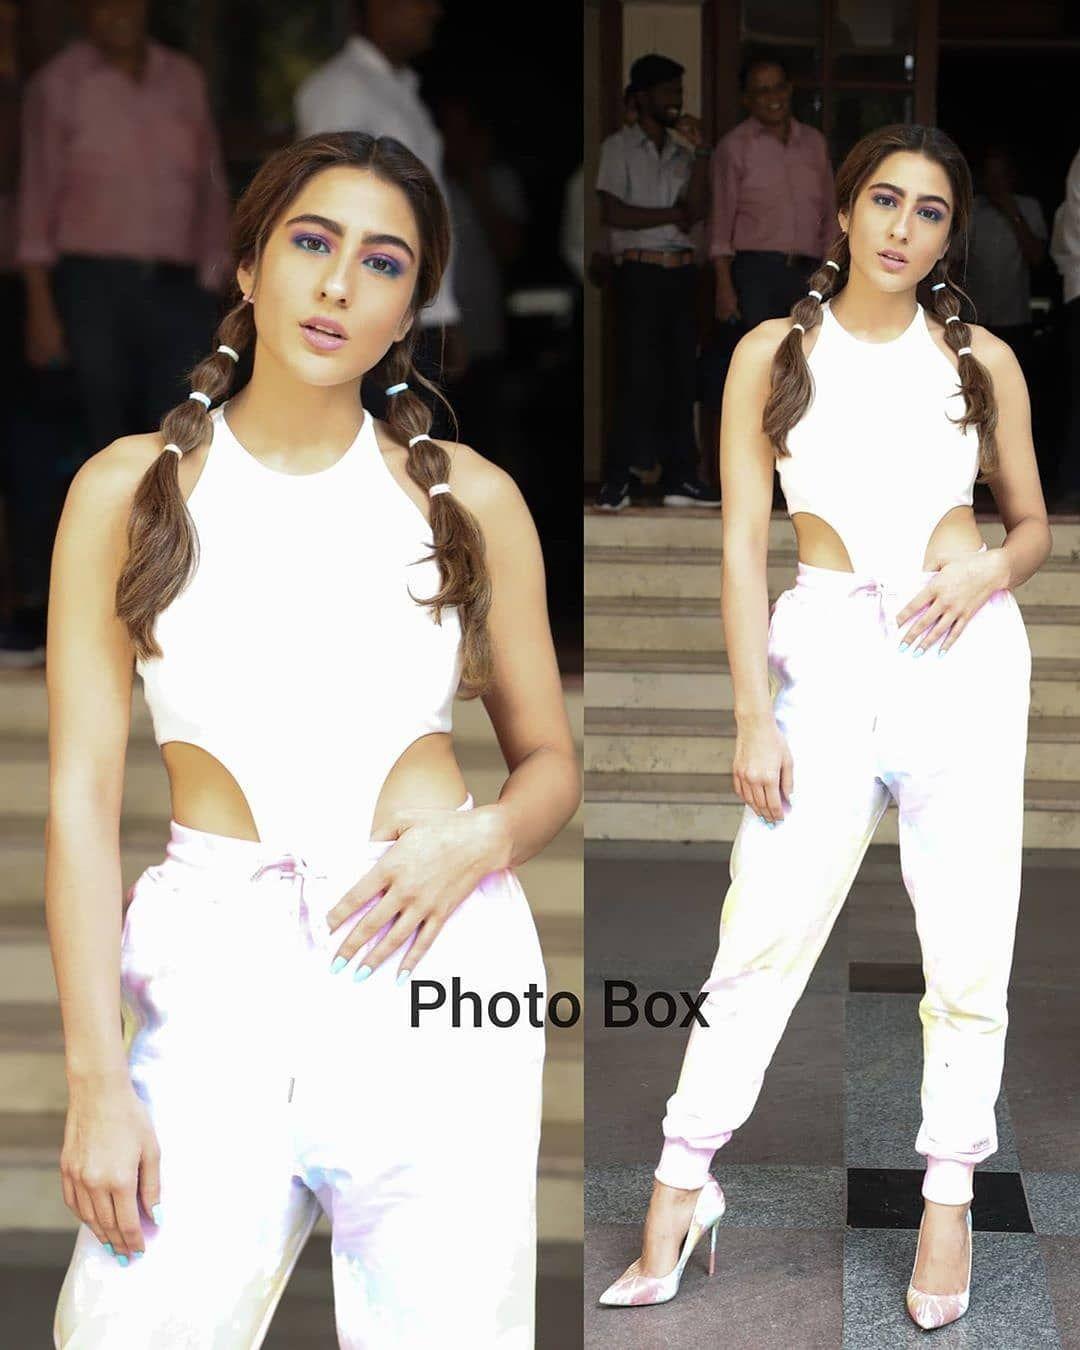 أول حساب تونسي لعشاق بوليوود On Instagram سارا علي خان كارتيك أريان خلال ترويجات فيلم Love Aaj Kal 2 Aajkal Lovea Fashion White Jeans Two Piece